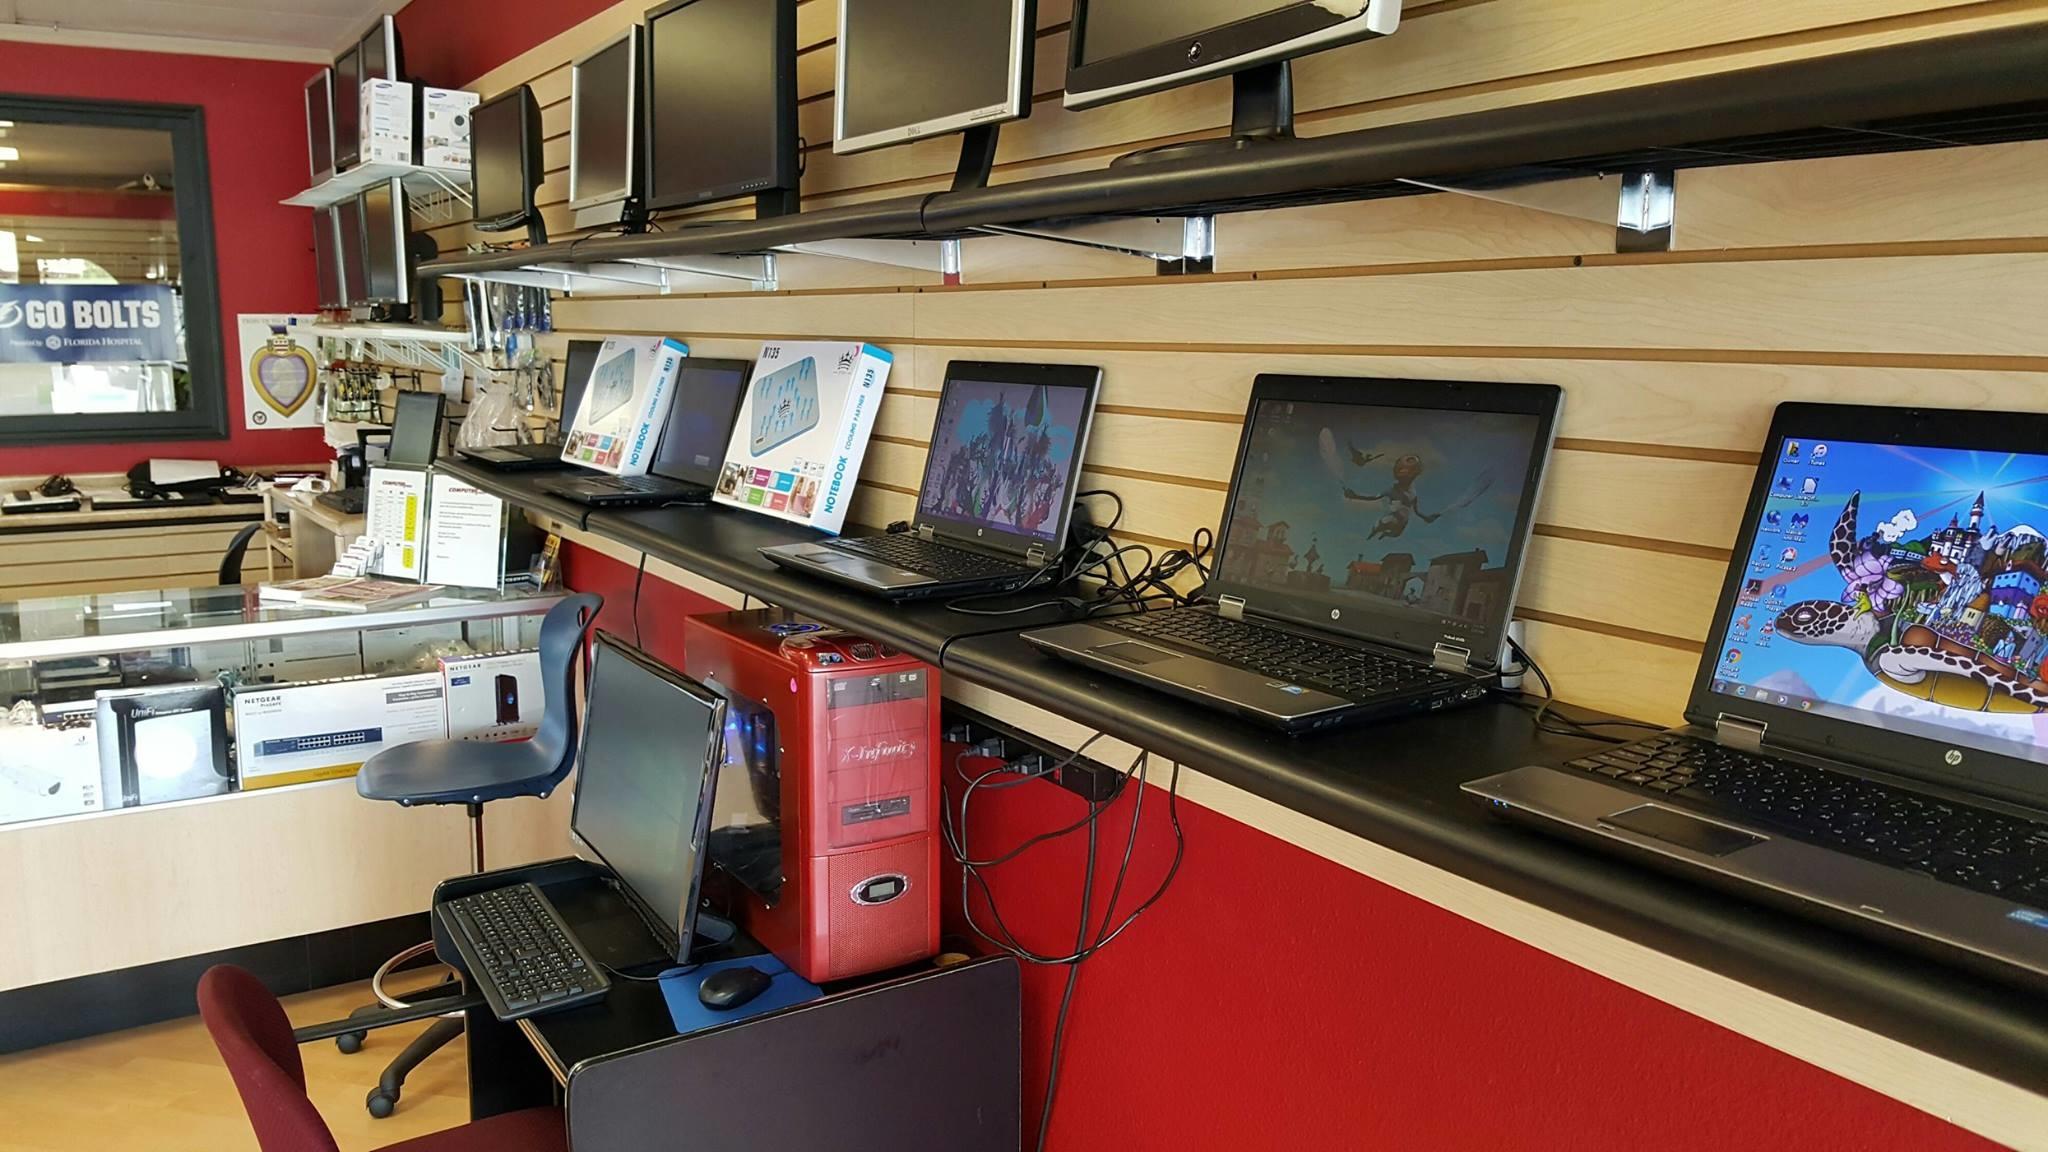 ComputerXpress - Computer Repair Services Lakeland FL image 1